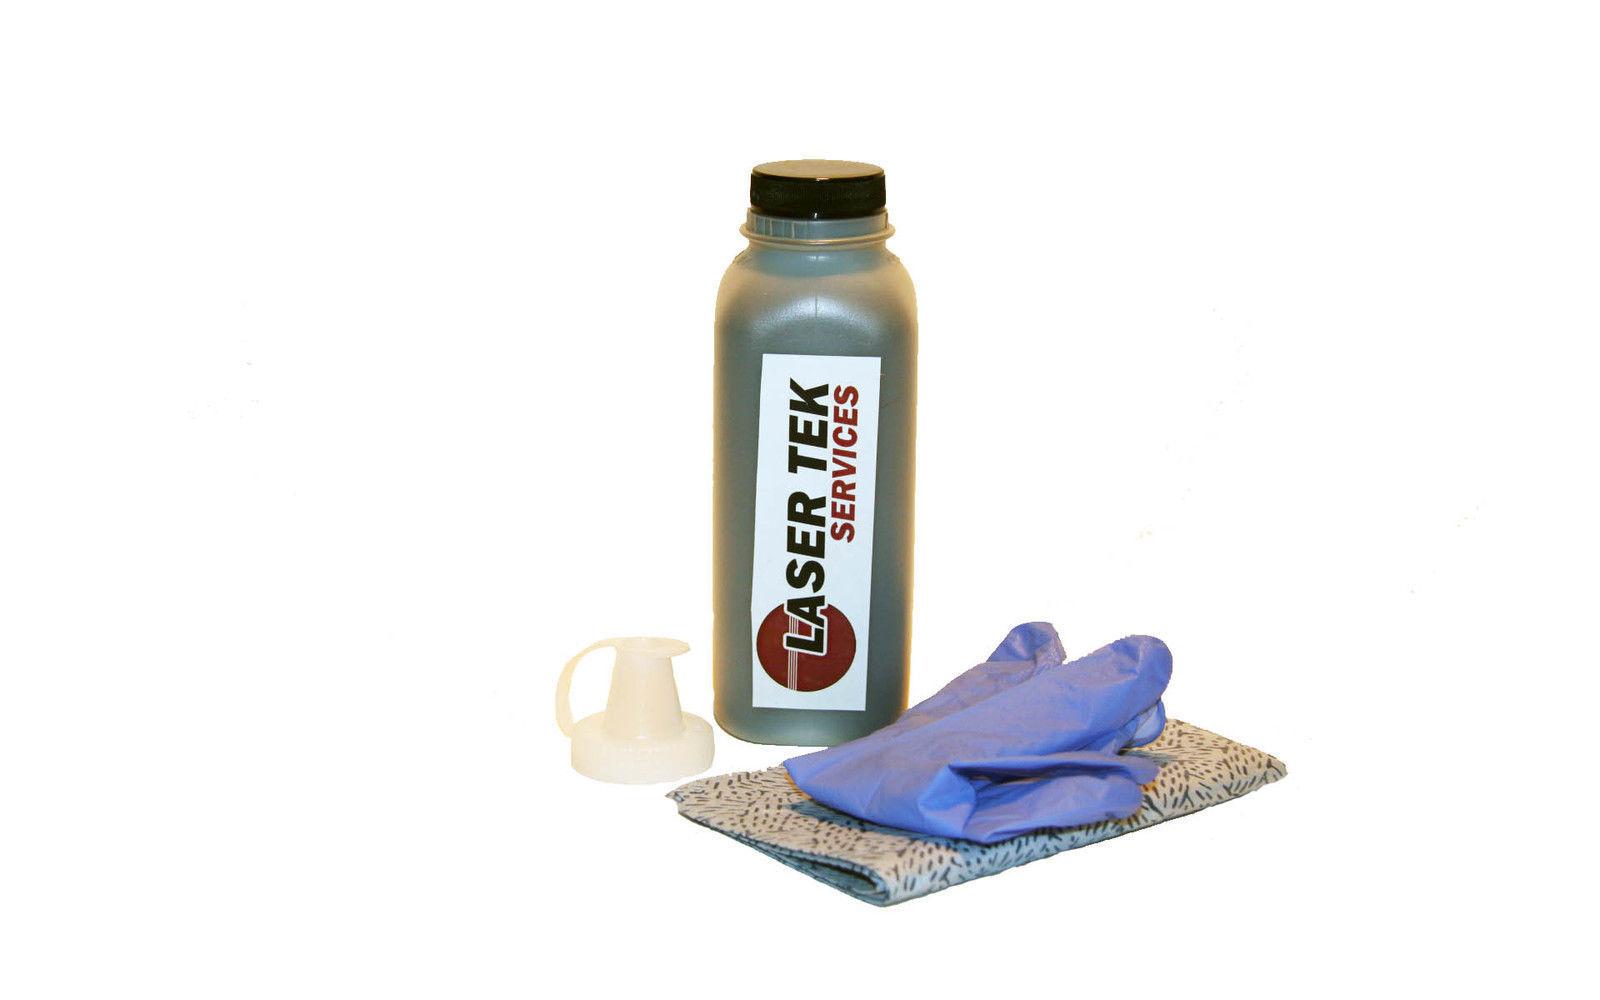 40g//Bottle,4 Black Refill Laser Copier Color Toner Powder Kit Kits for Xerox Creo Spire CXP3535 CX P3535 C XP3535 CXP 3535 006R01153 Laser Printer